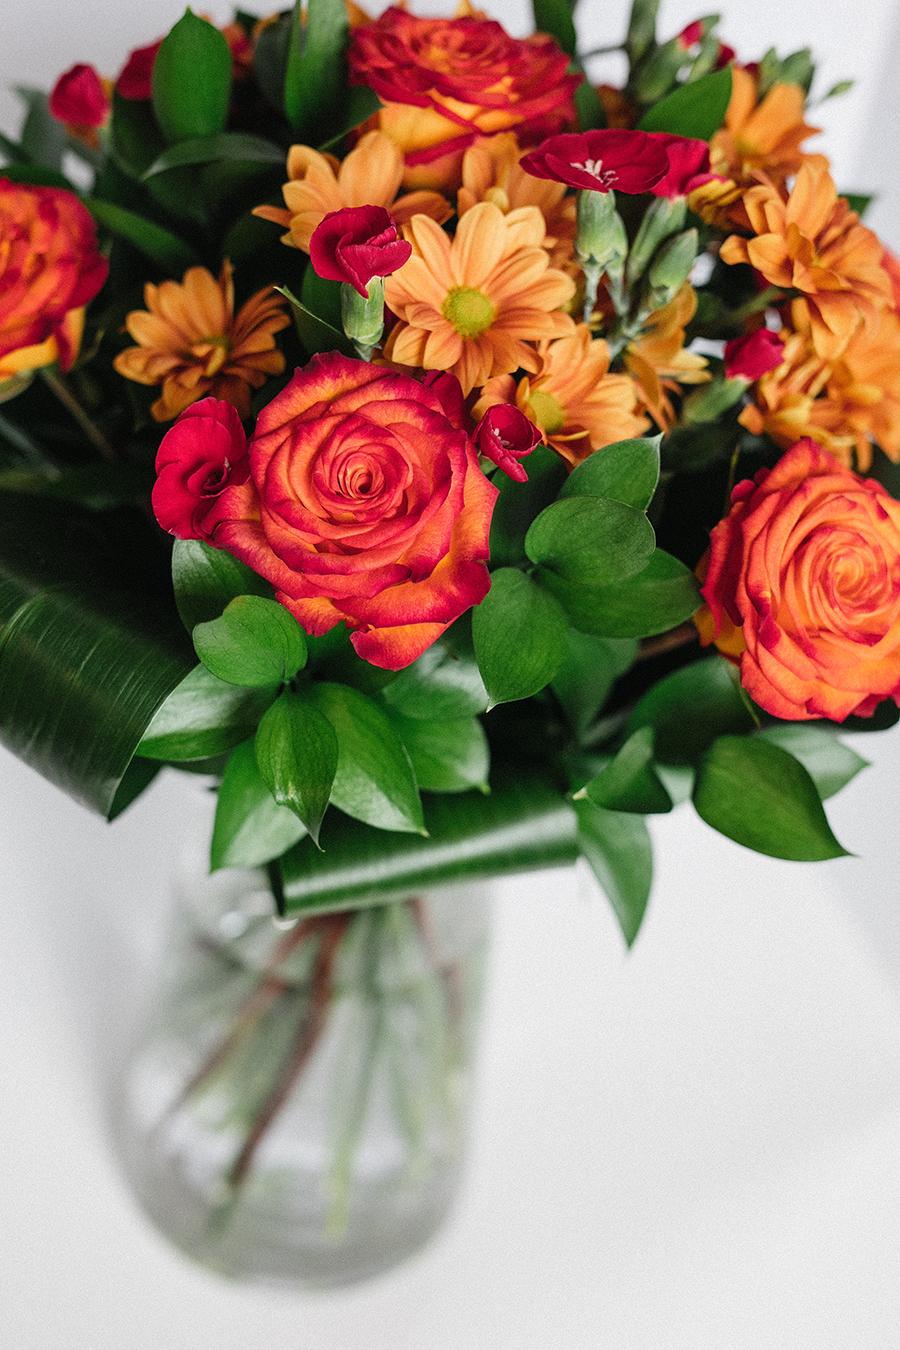 Bouquet de rose circus, dianthus, marguerite.